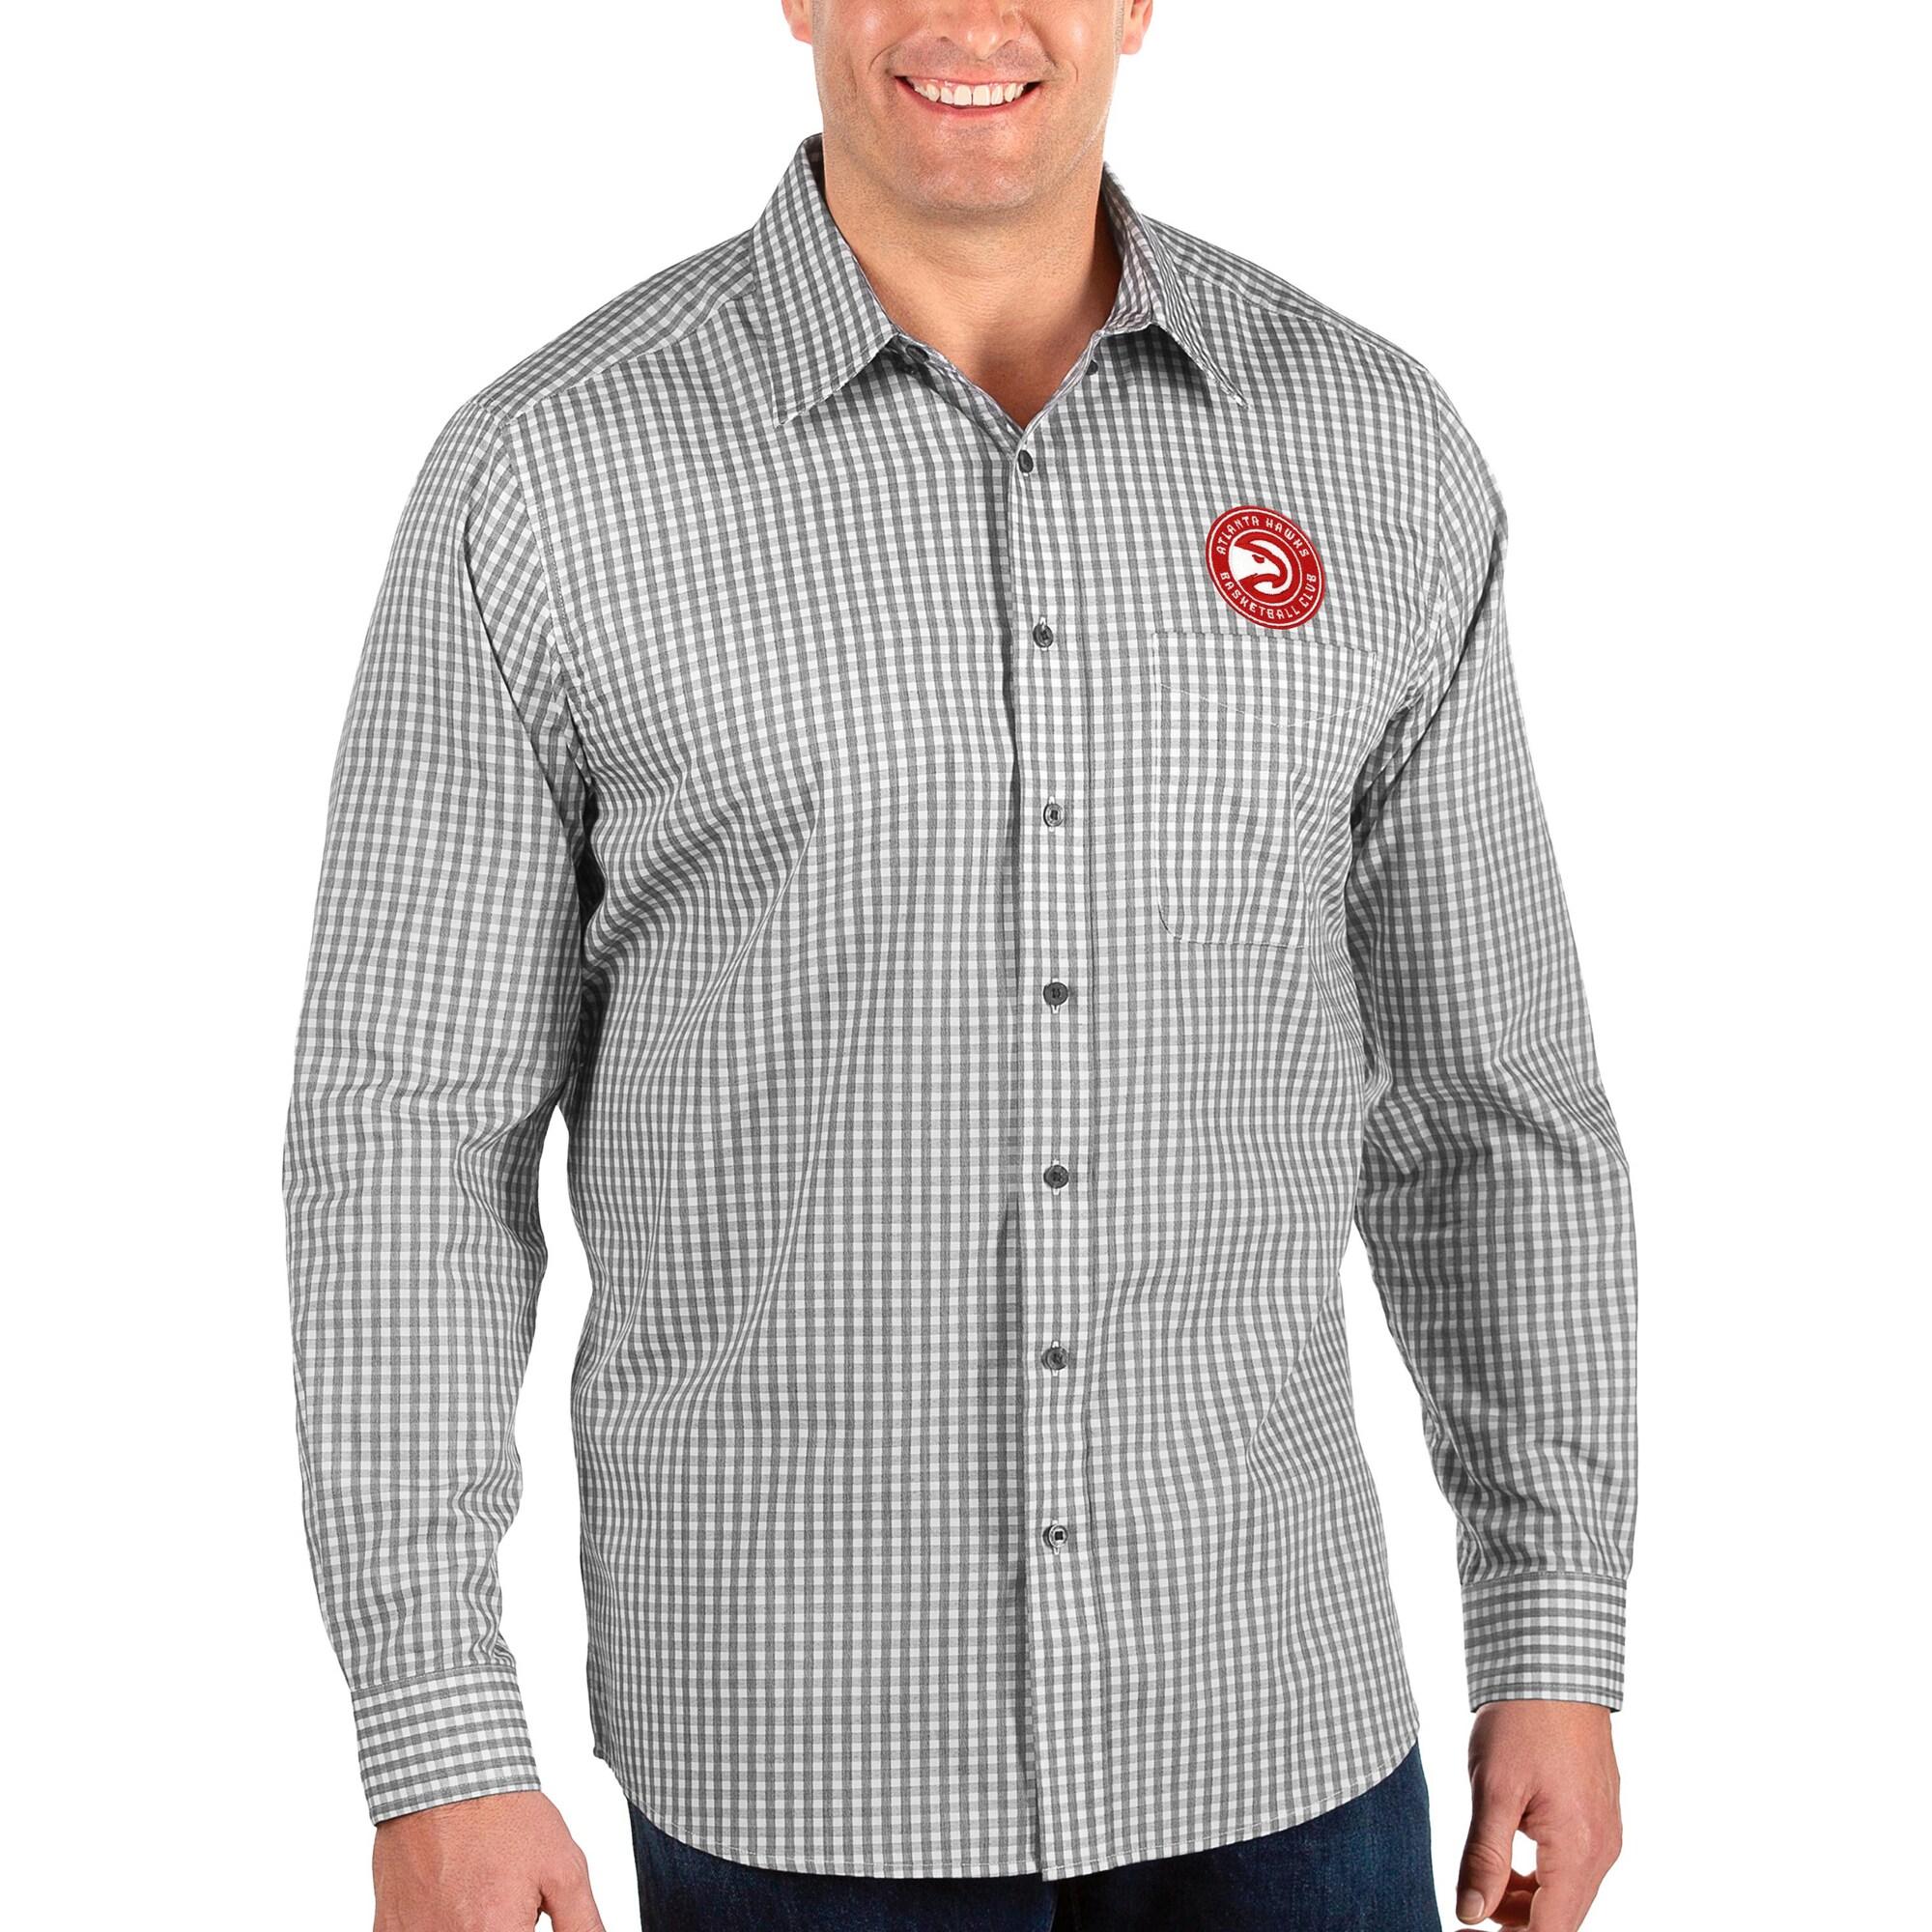 Atlanta Hawks Antigua Big & Tall Structure Long Sleeve Button-Up Shirt - Black/White